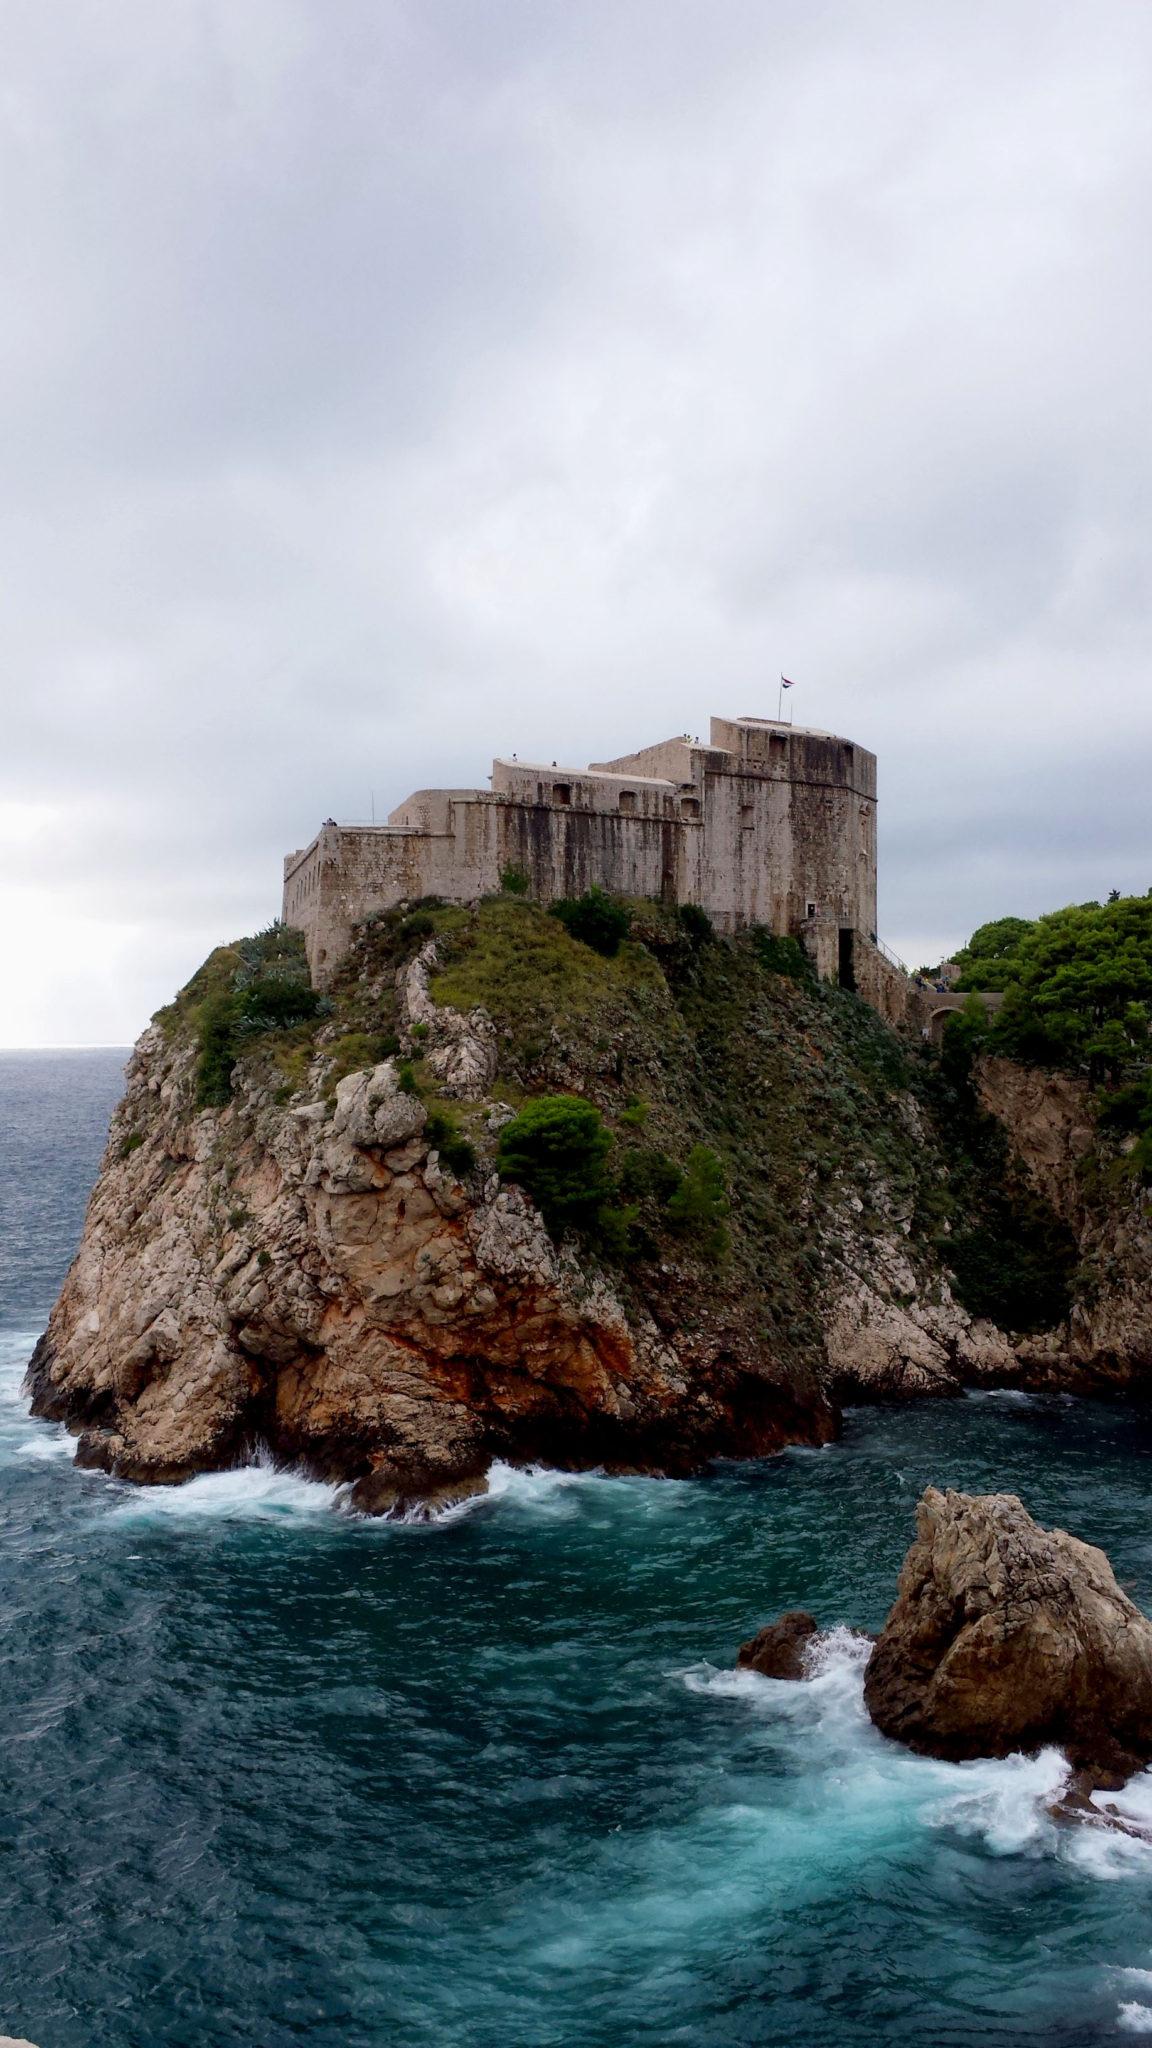 Hema_blog_mode_voyage_croatie_une_journee_a_dubrovnik_vue_des_remparts8